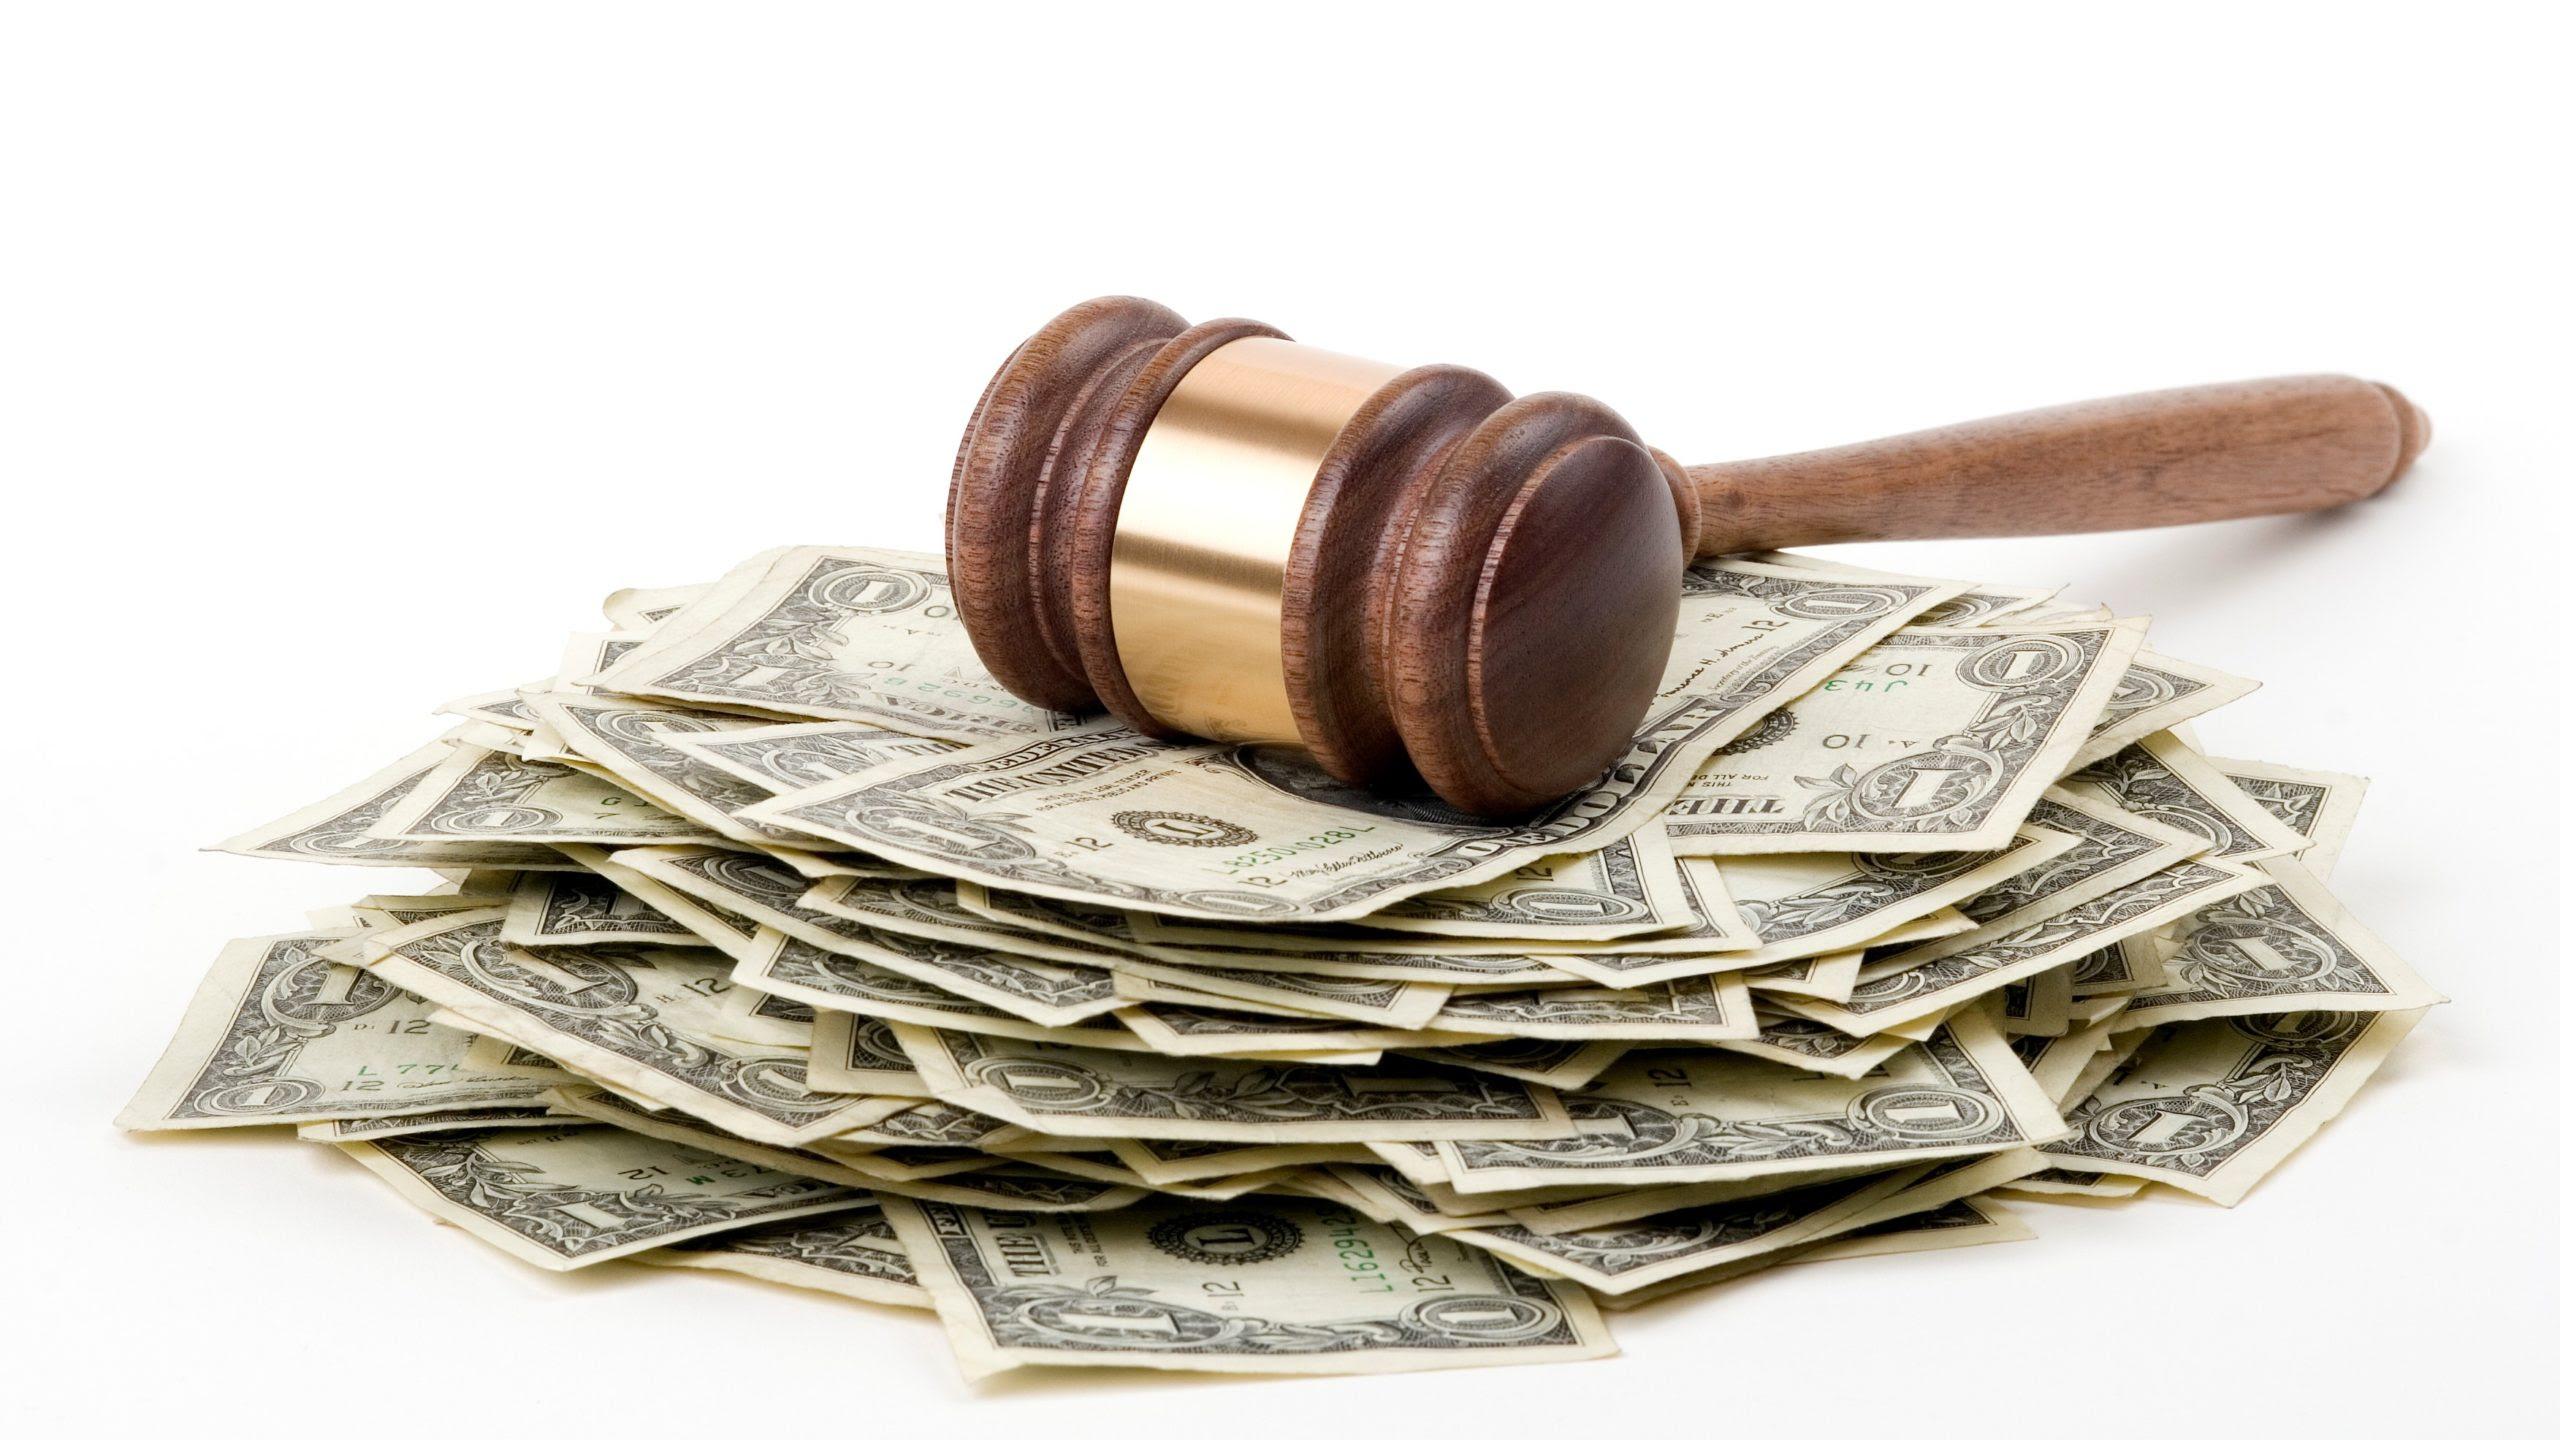 Павел Барбул: 7 советов молодым юристам